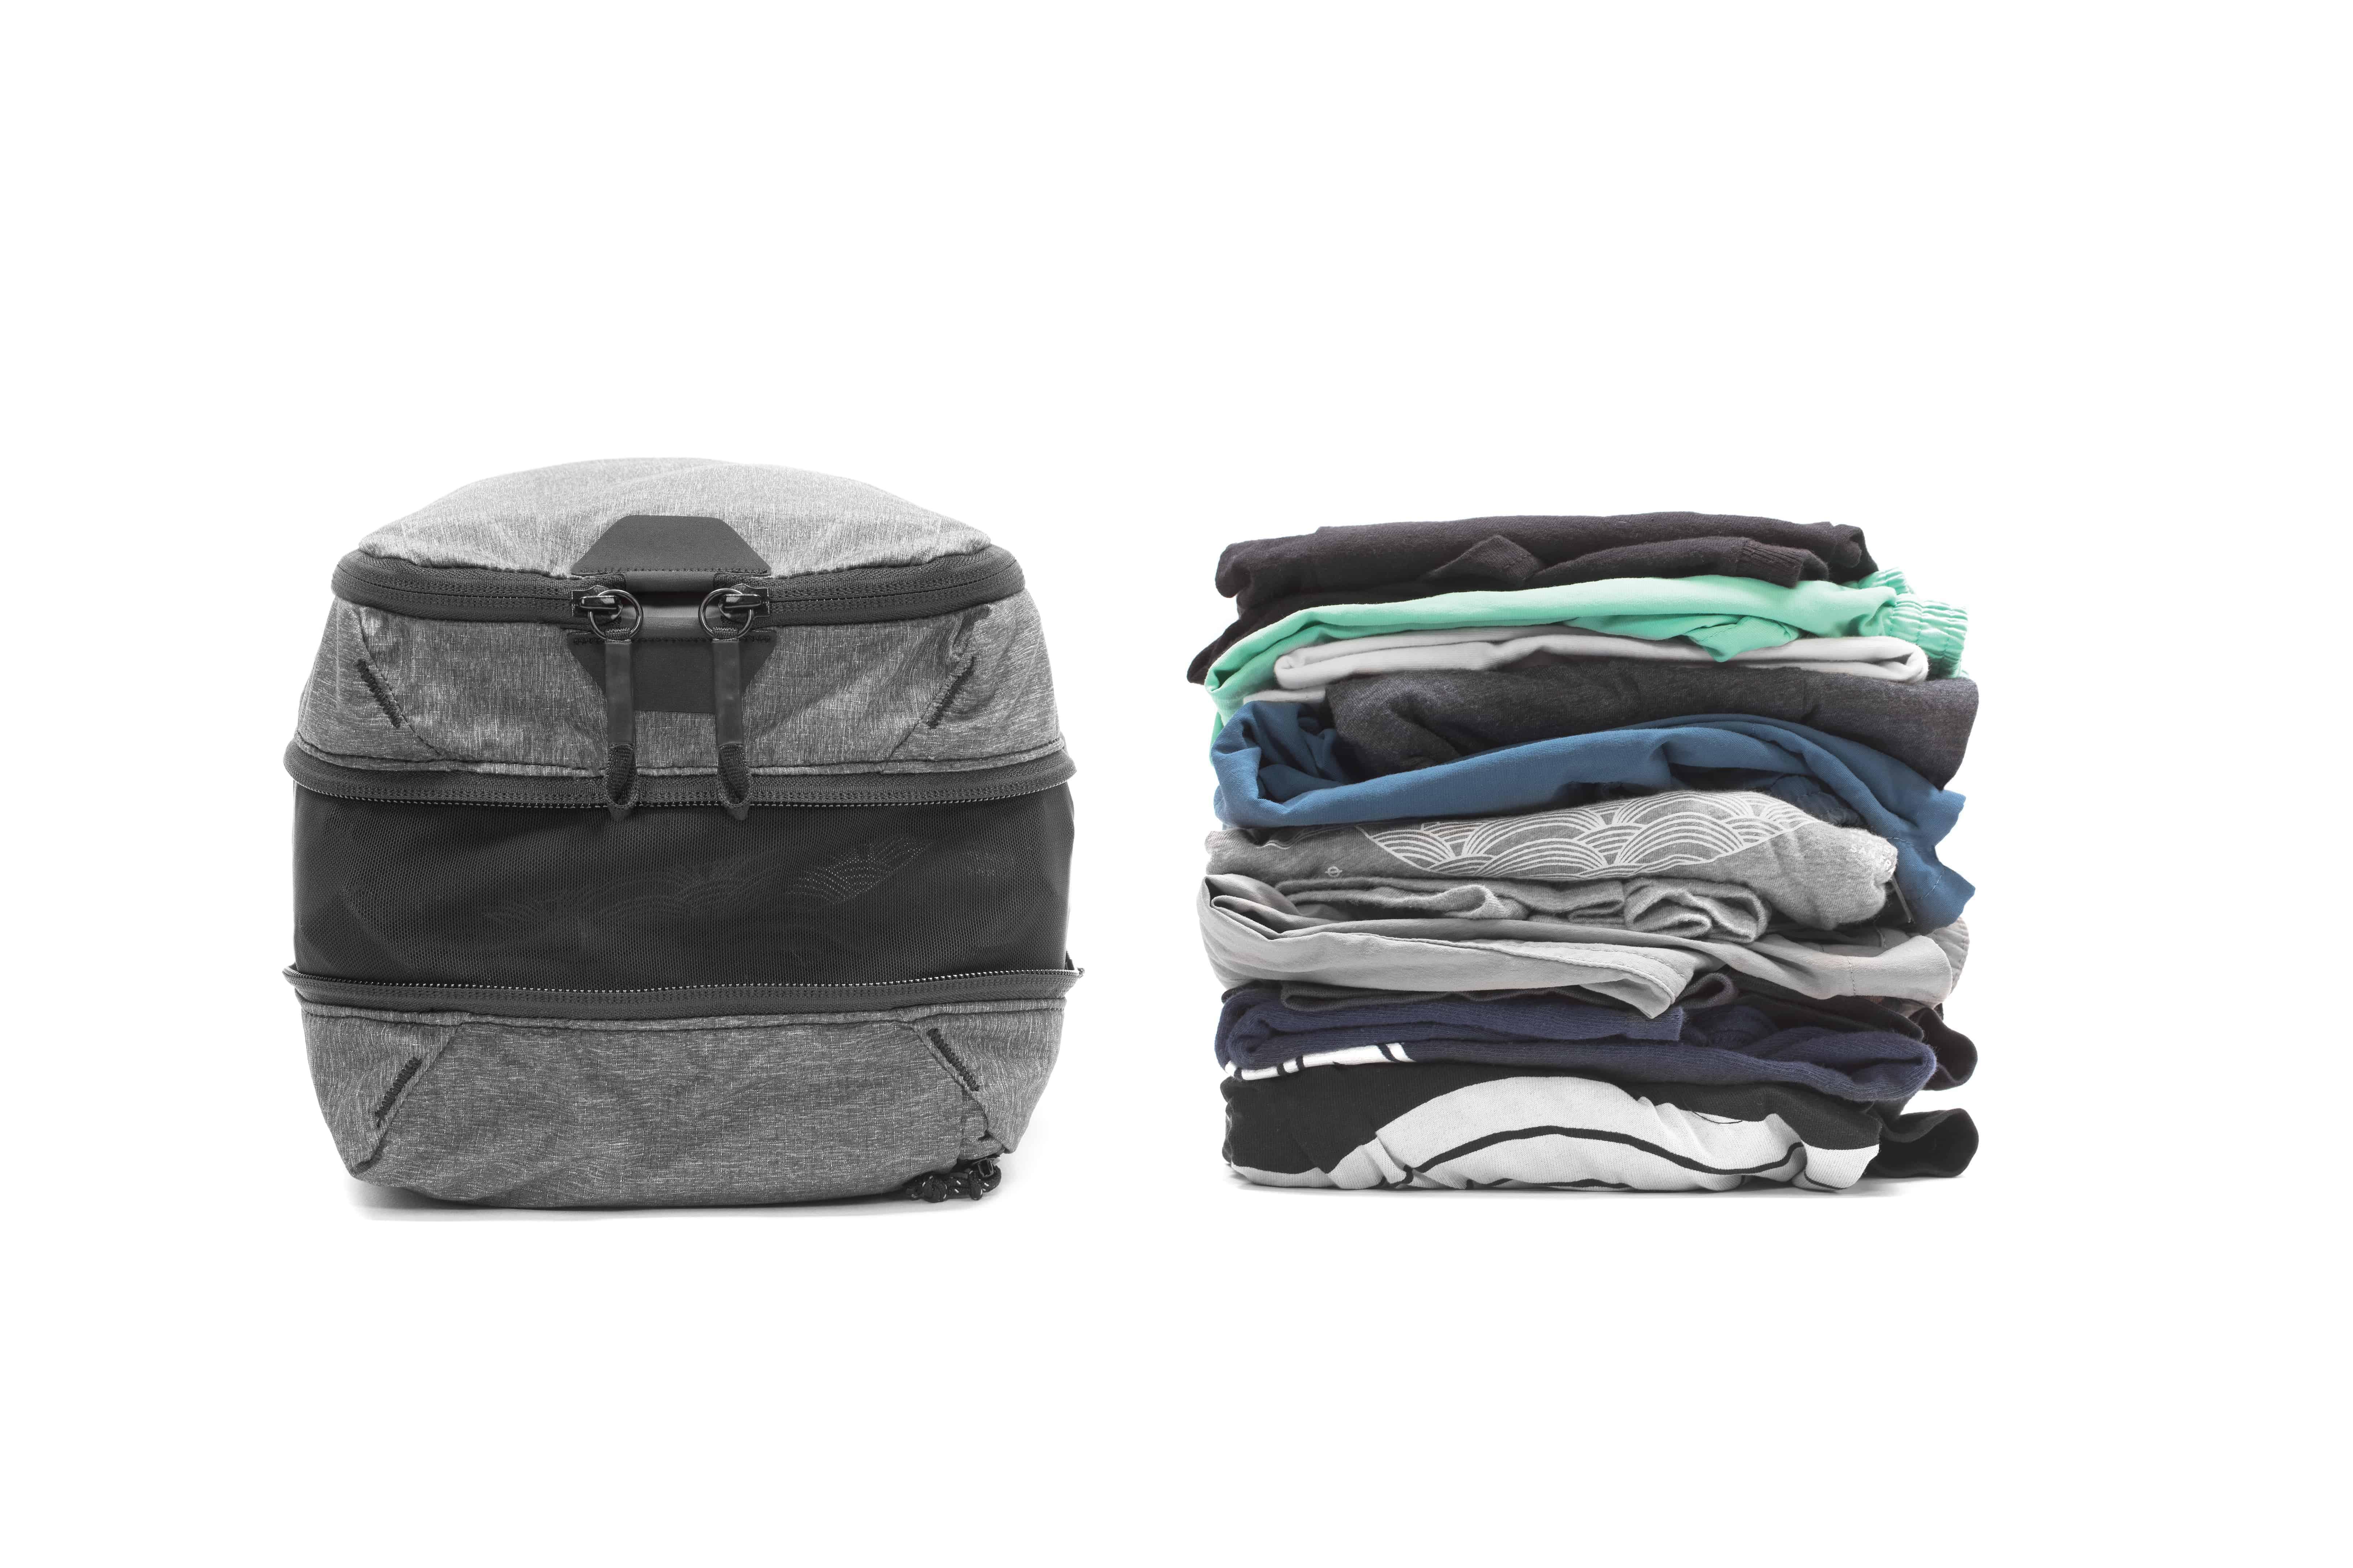 Peak Design Travel Line Packing Cube